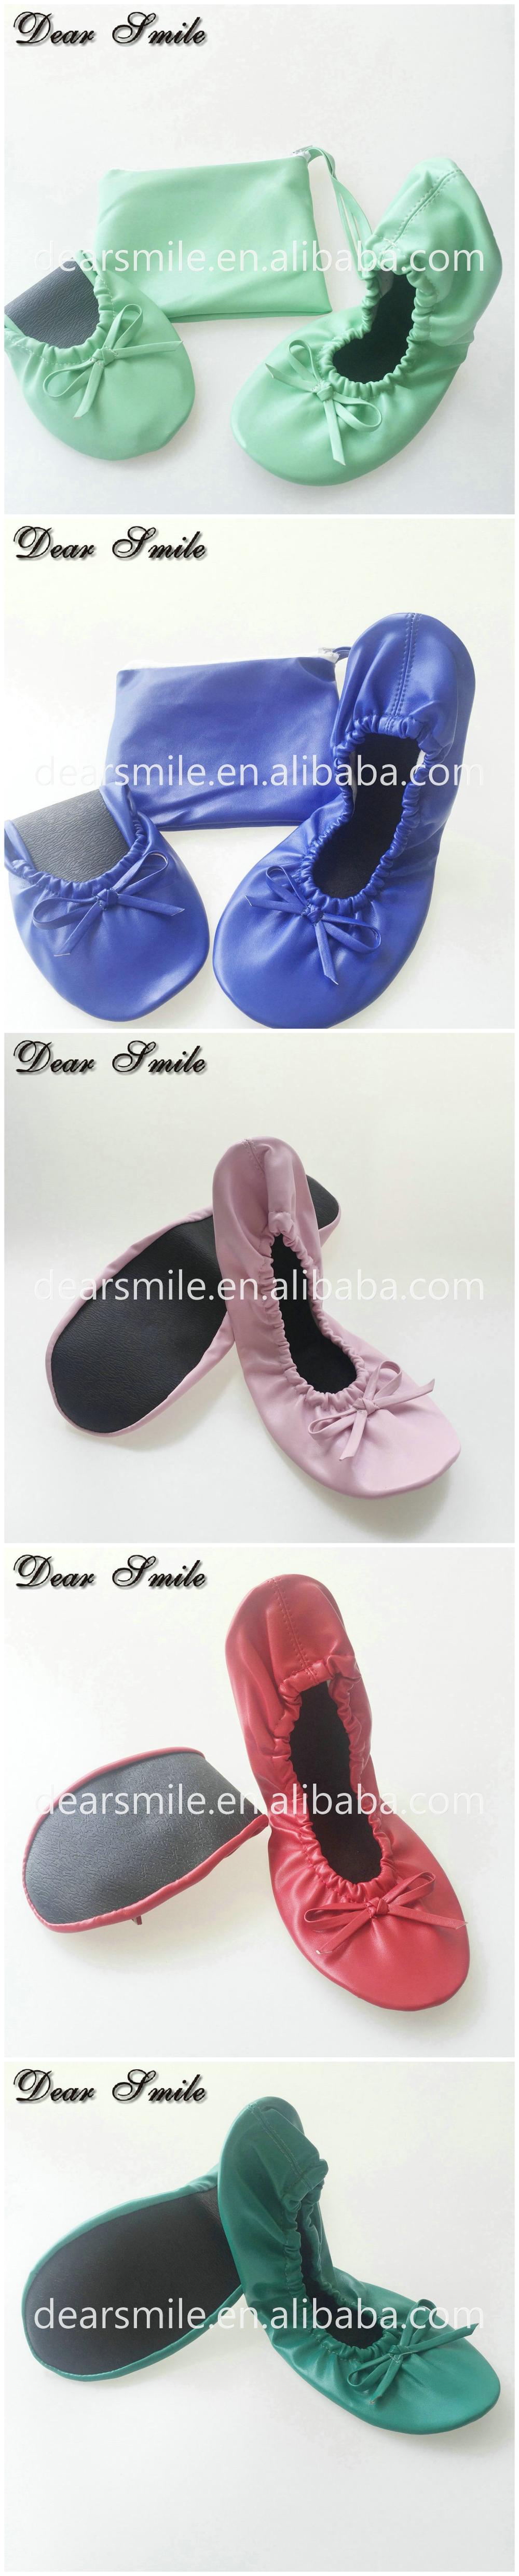 Blue XL LARGE Size Flat Pumps Women Foldable Ballet Shoes in Bag UK SIZE 8//9